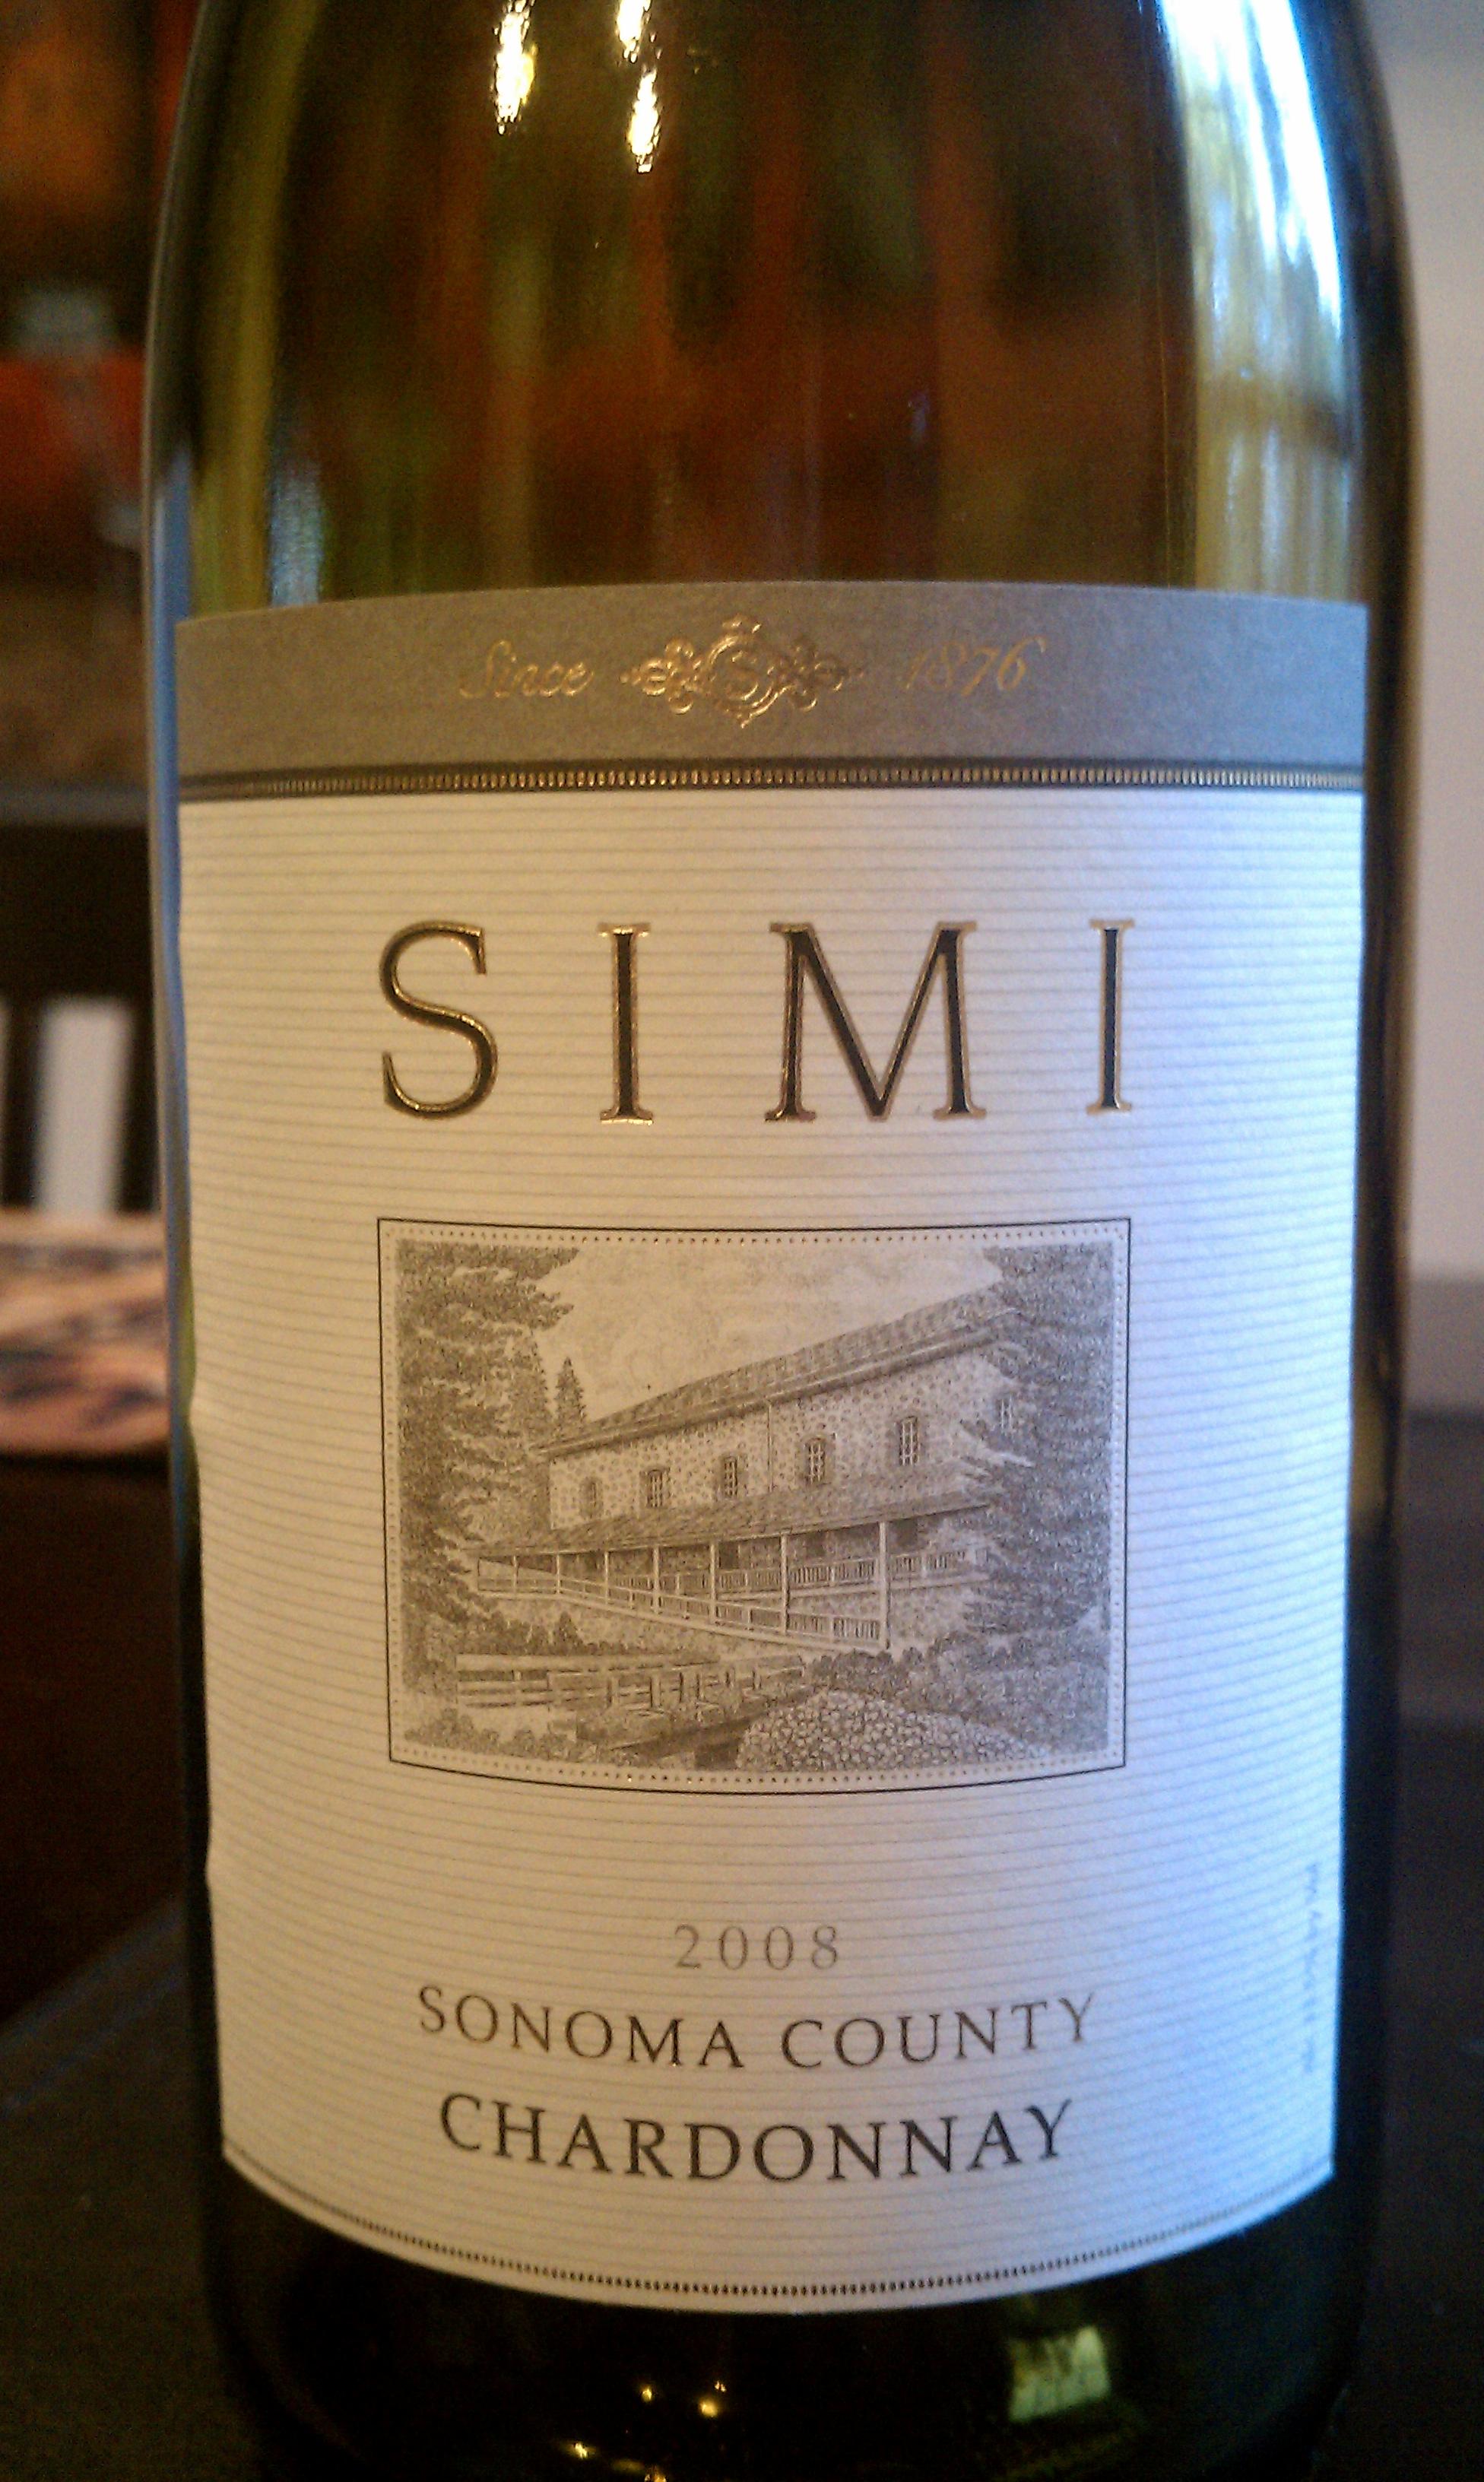 2008 Simi Chardonnay